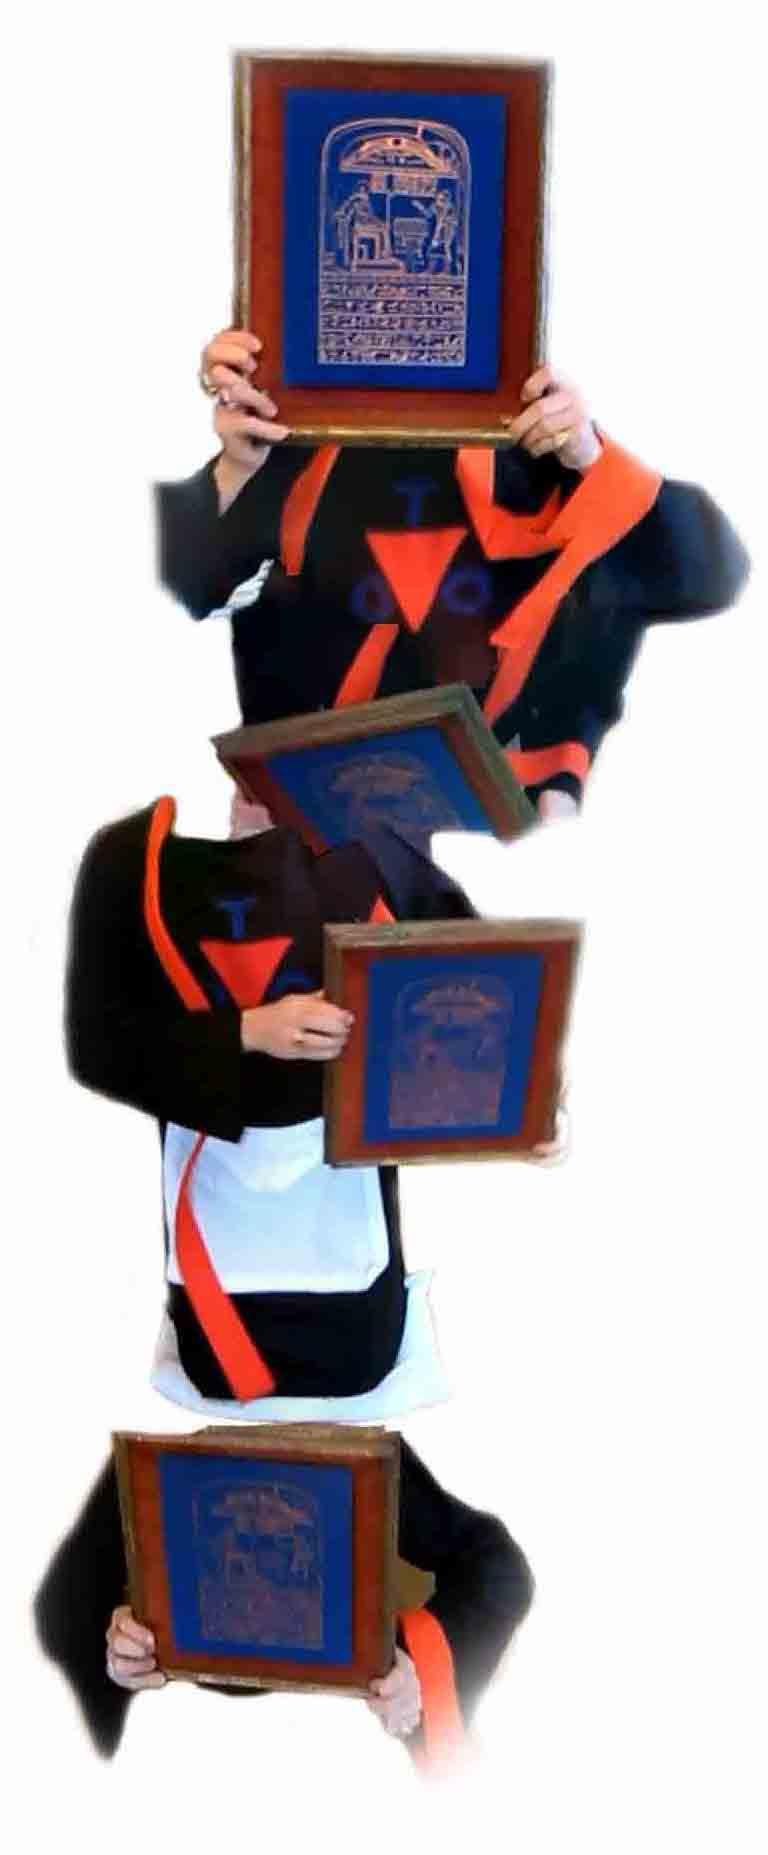 Ordo Templi Orientis Liber AL vel Legis Book of the Law Aleister Crowley O.T.O. Cairo 1904 Stele of Revealing